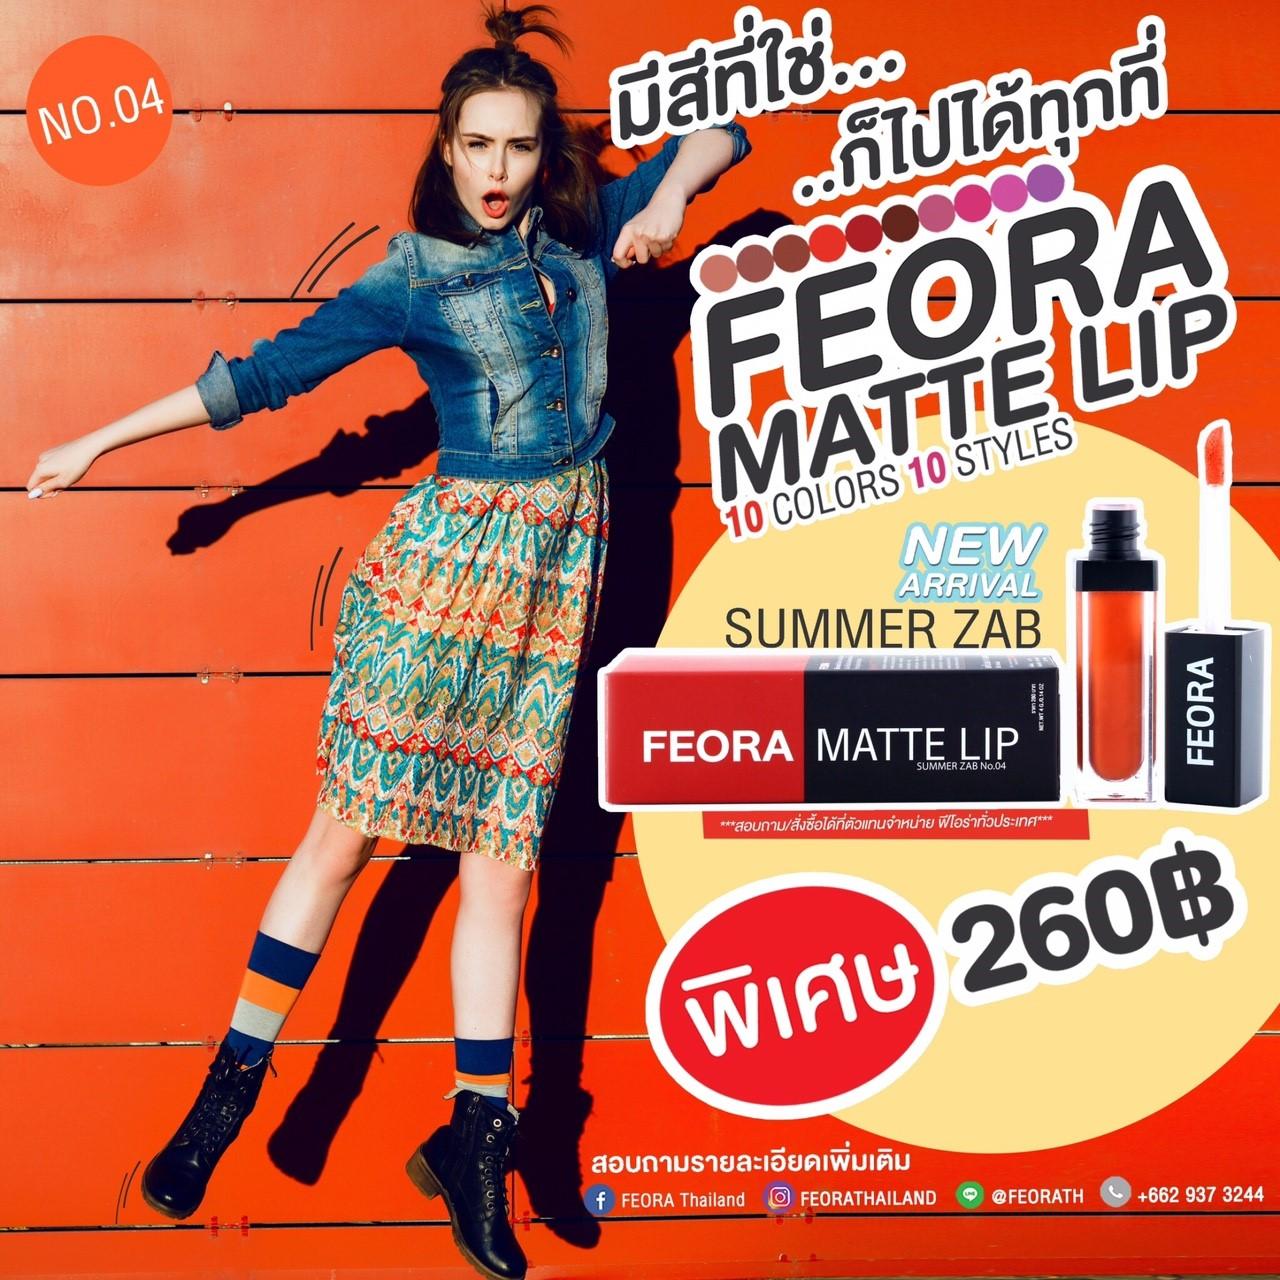 FEORA MATTE LIP NO.04 SUMMER ZAB